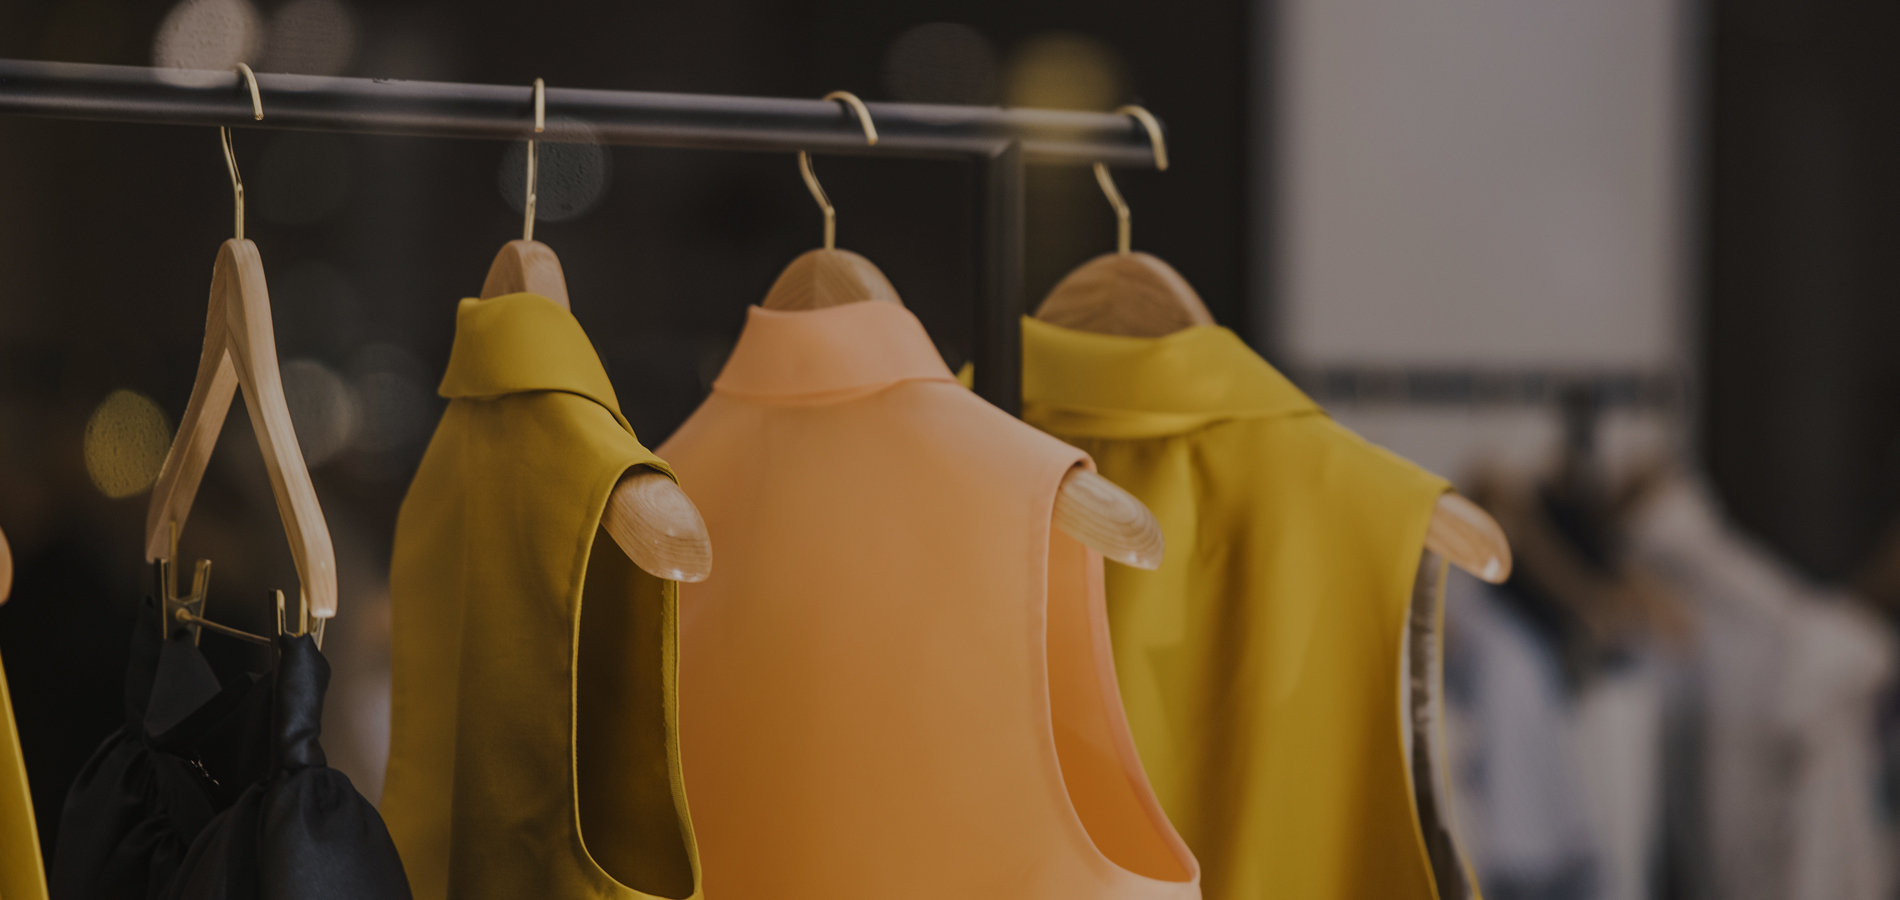 Fashion clothes on rail